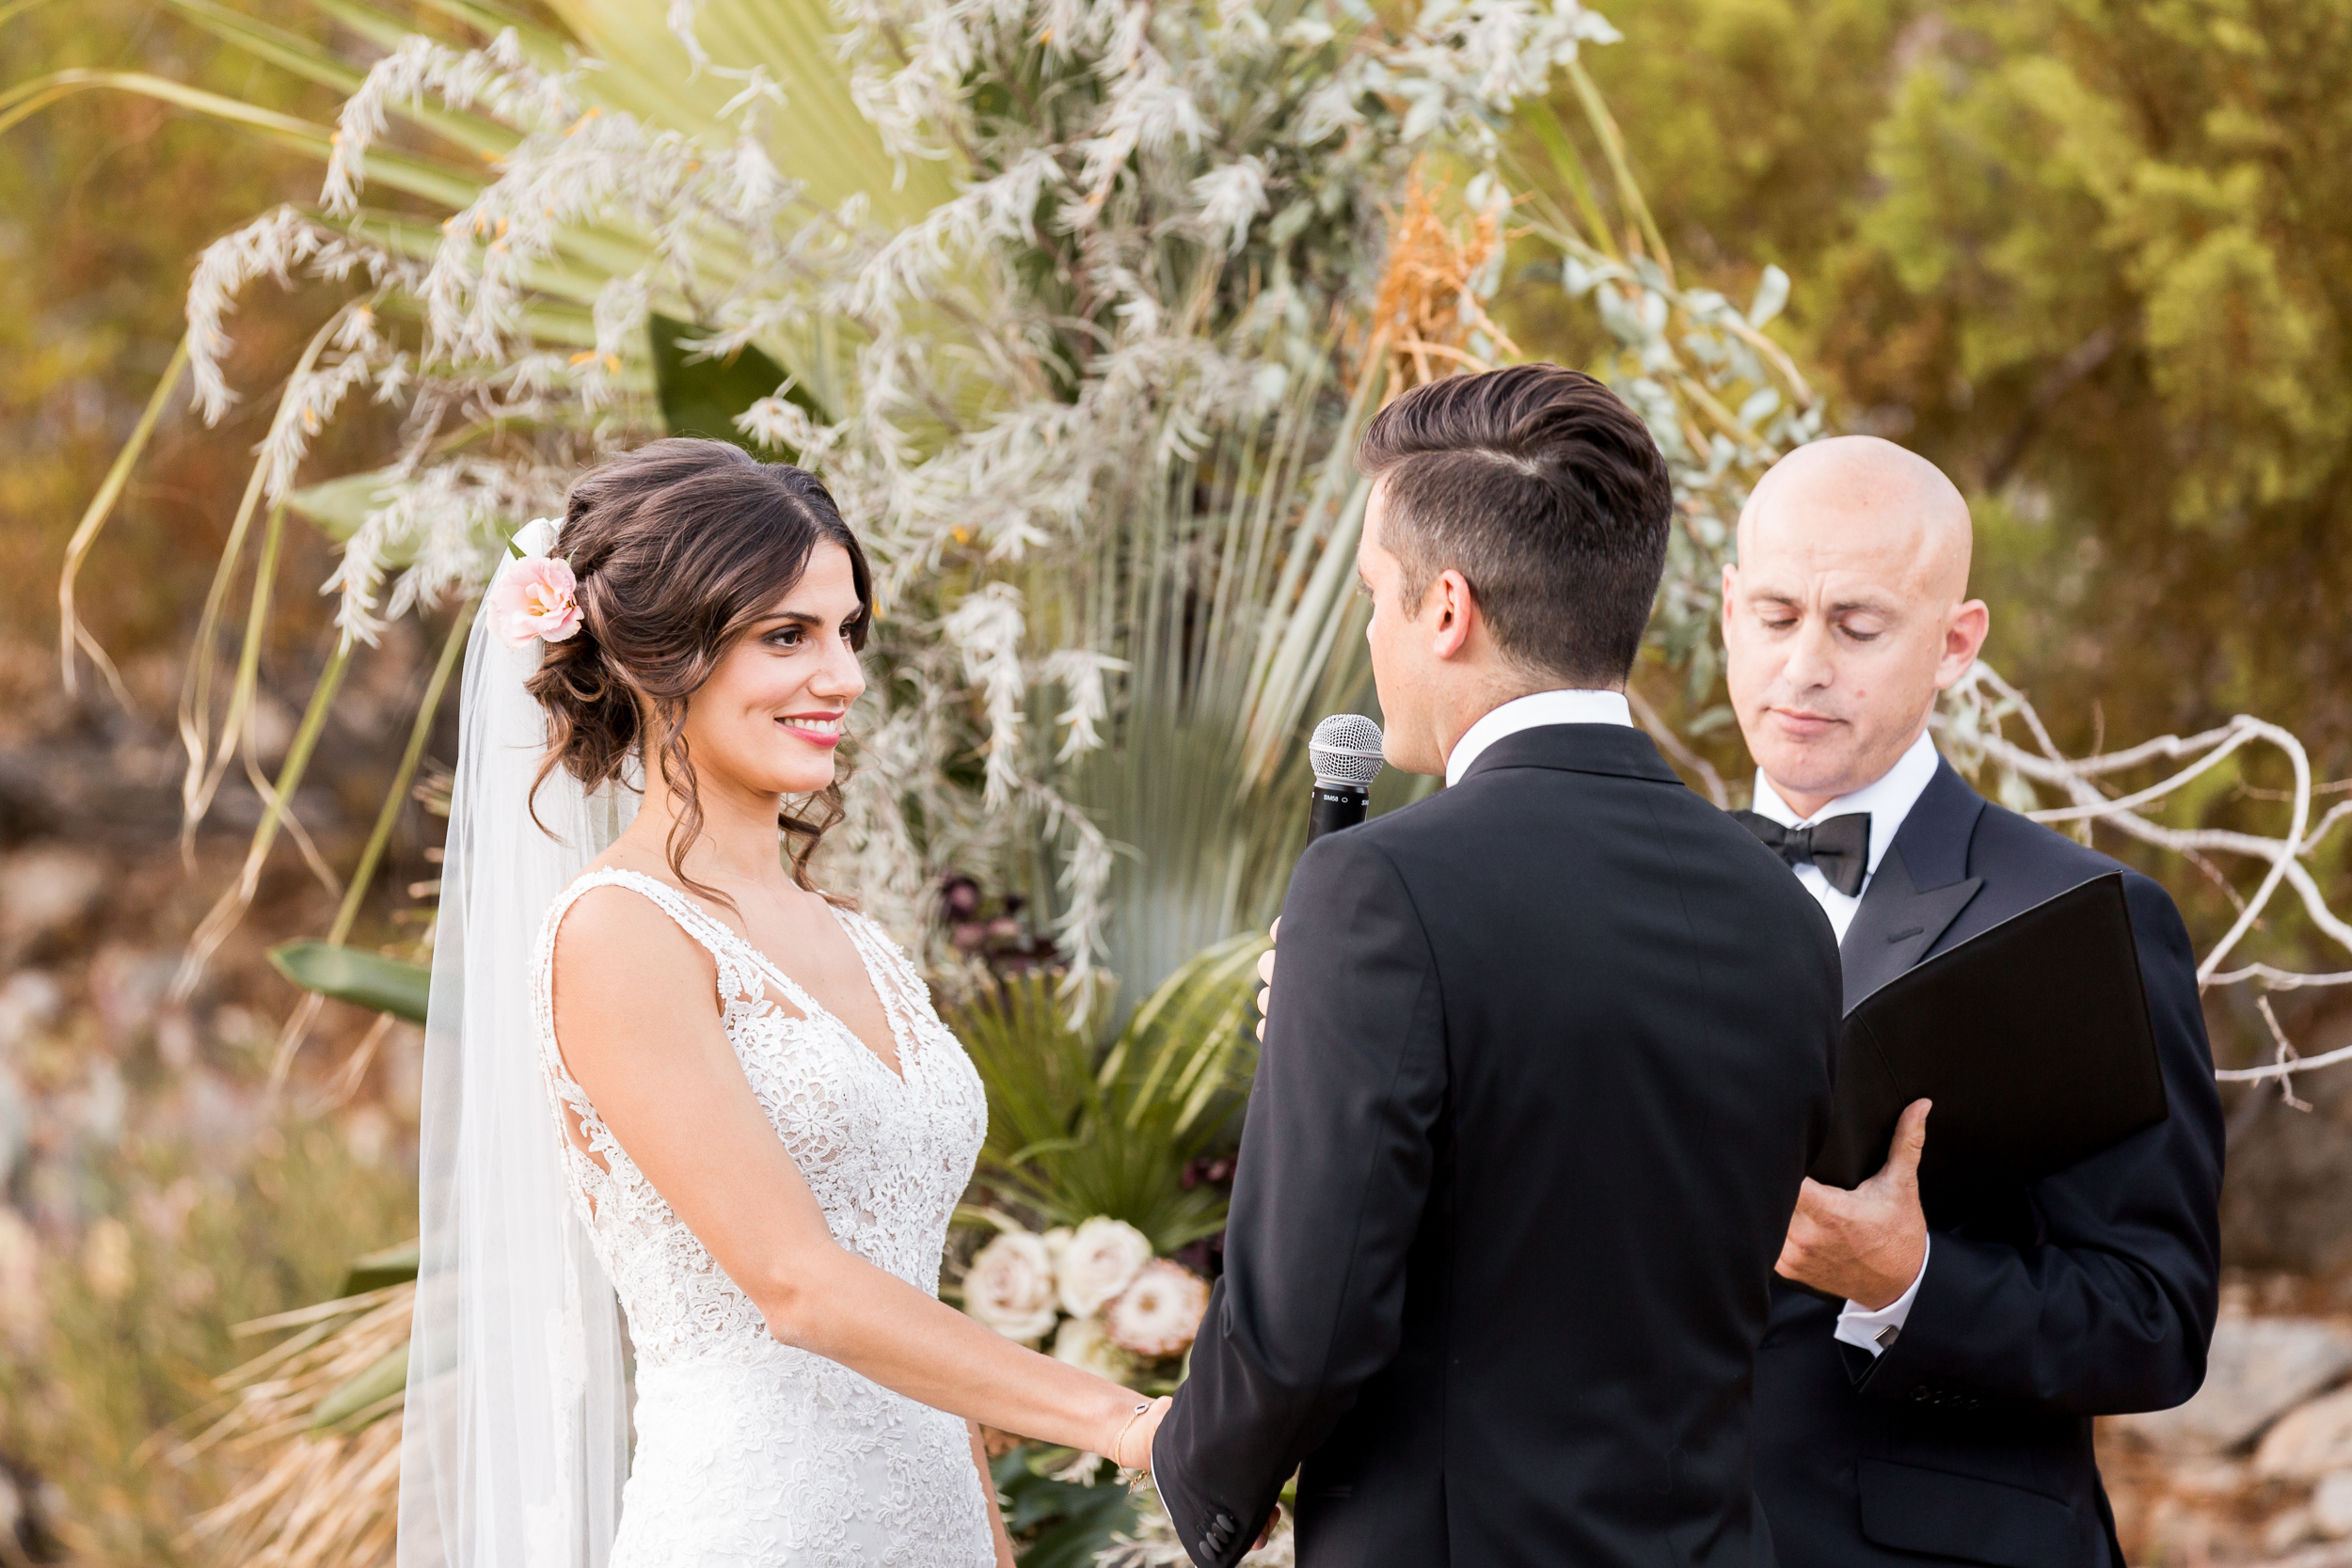 palm_springs_wedding_photographer_34.jpg